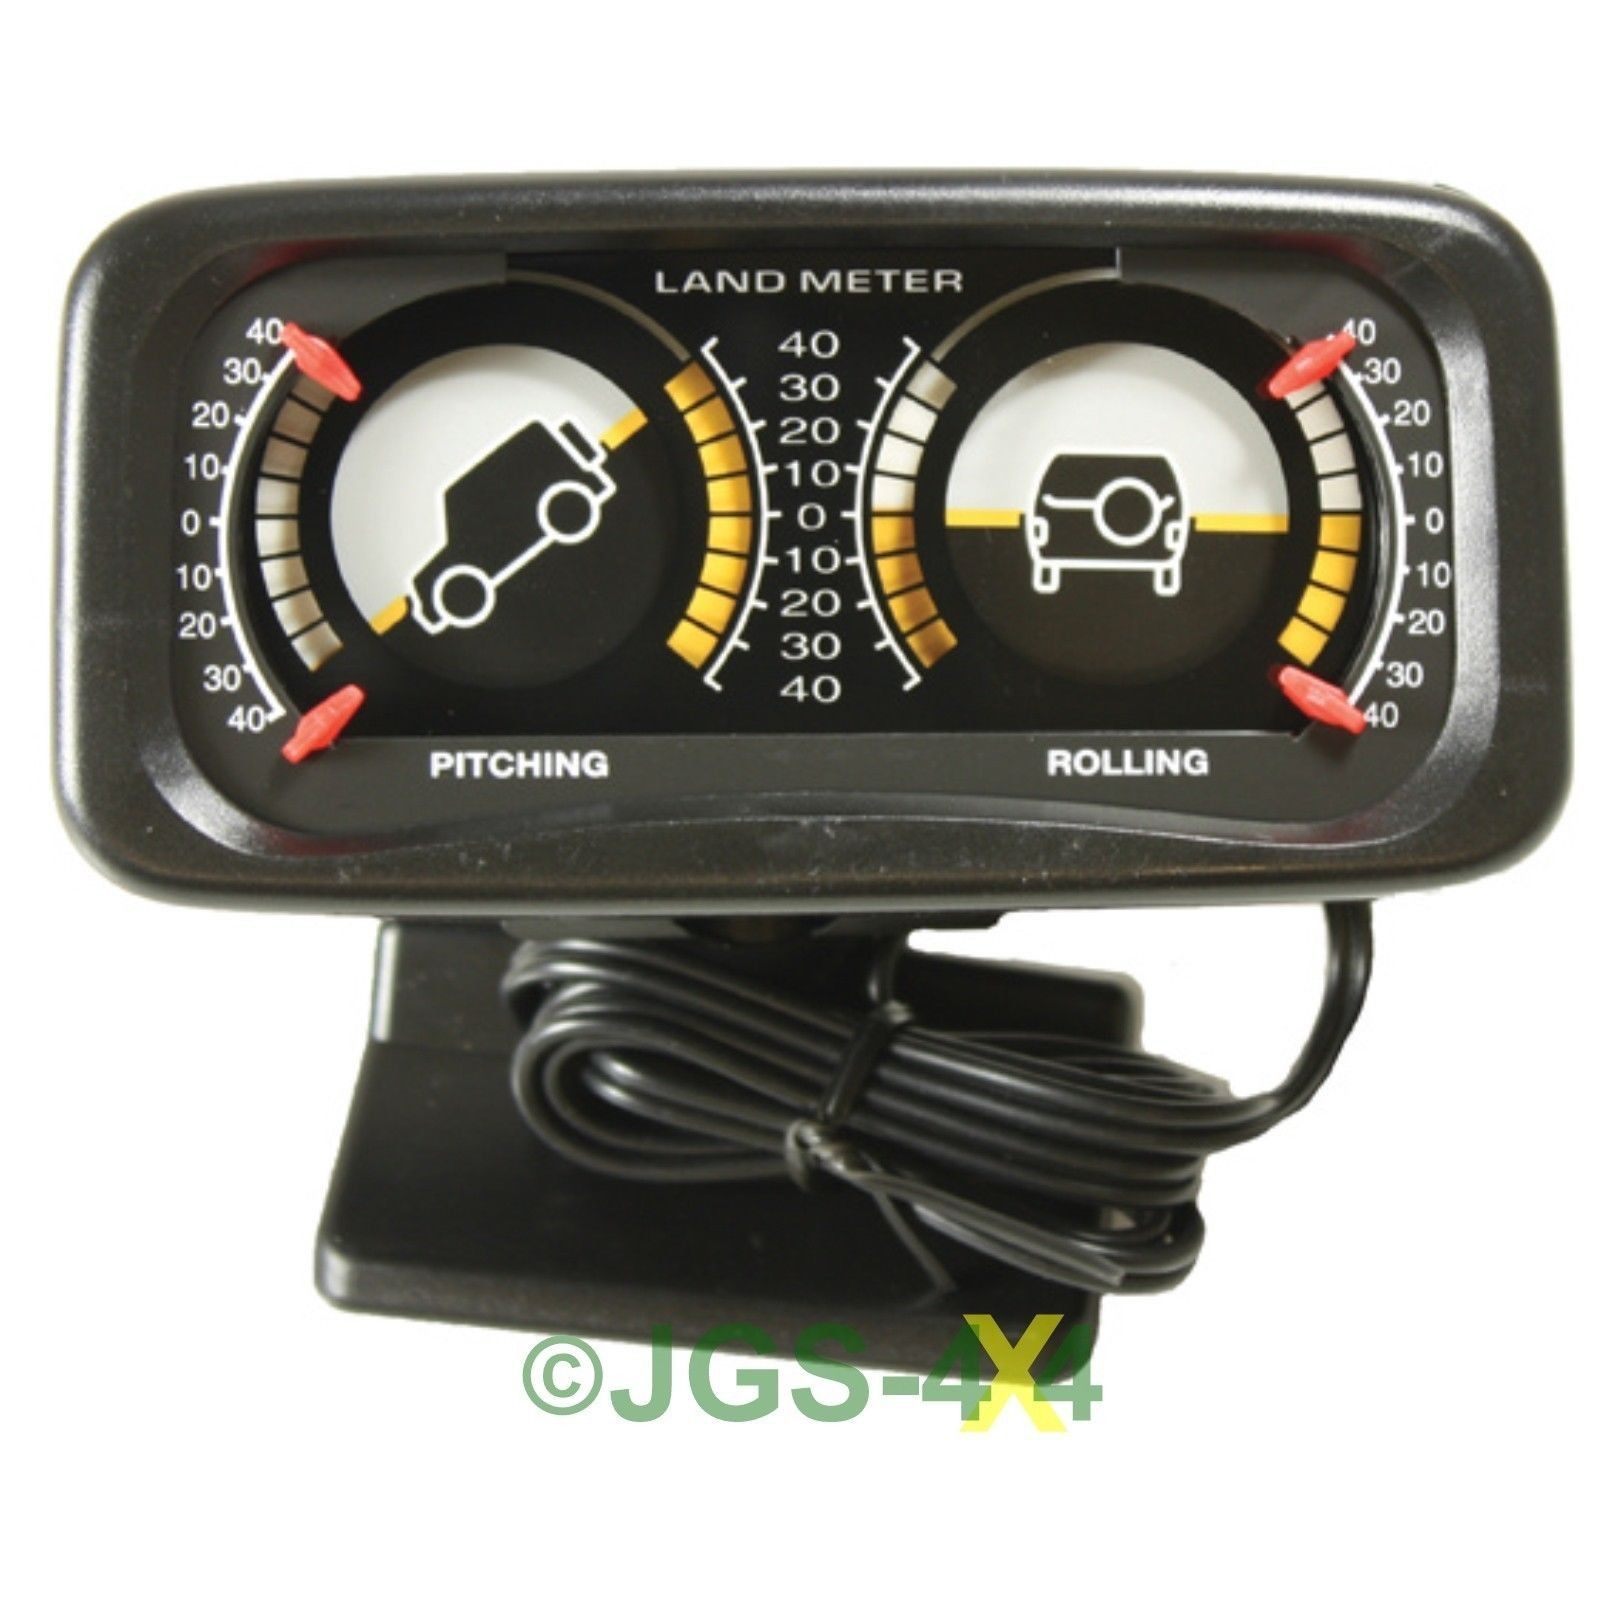 Off Road 4x4 Inclinometer Land Gauge Clinometer Land Rover